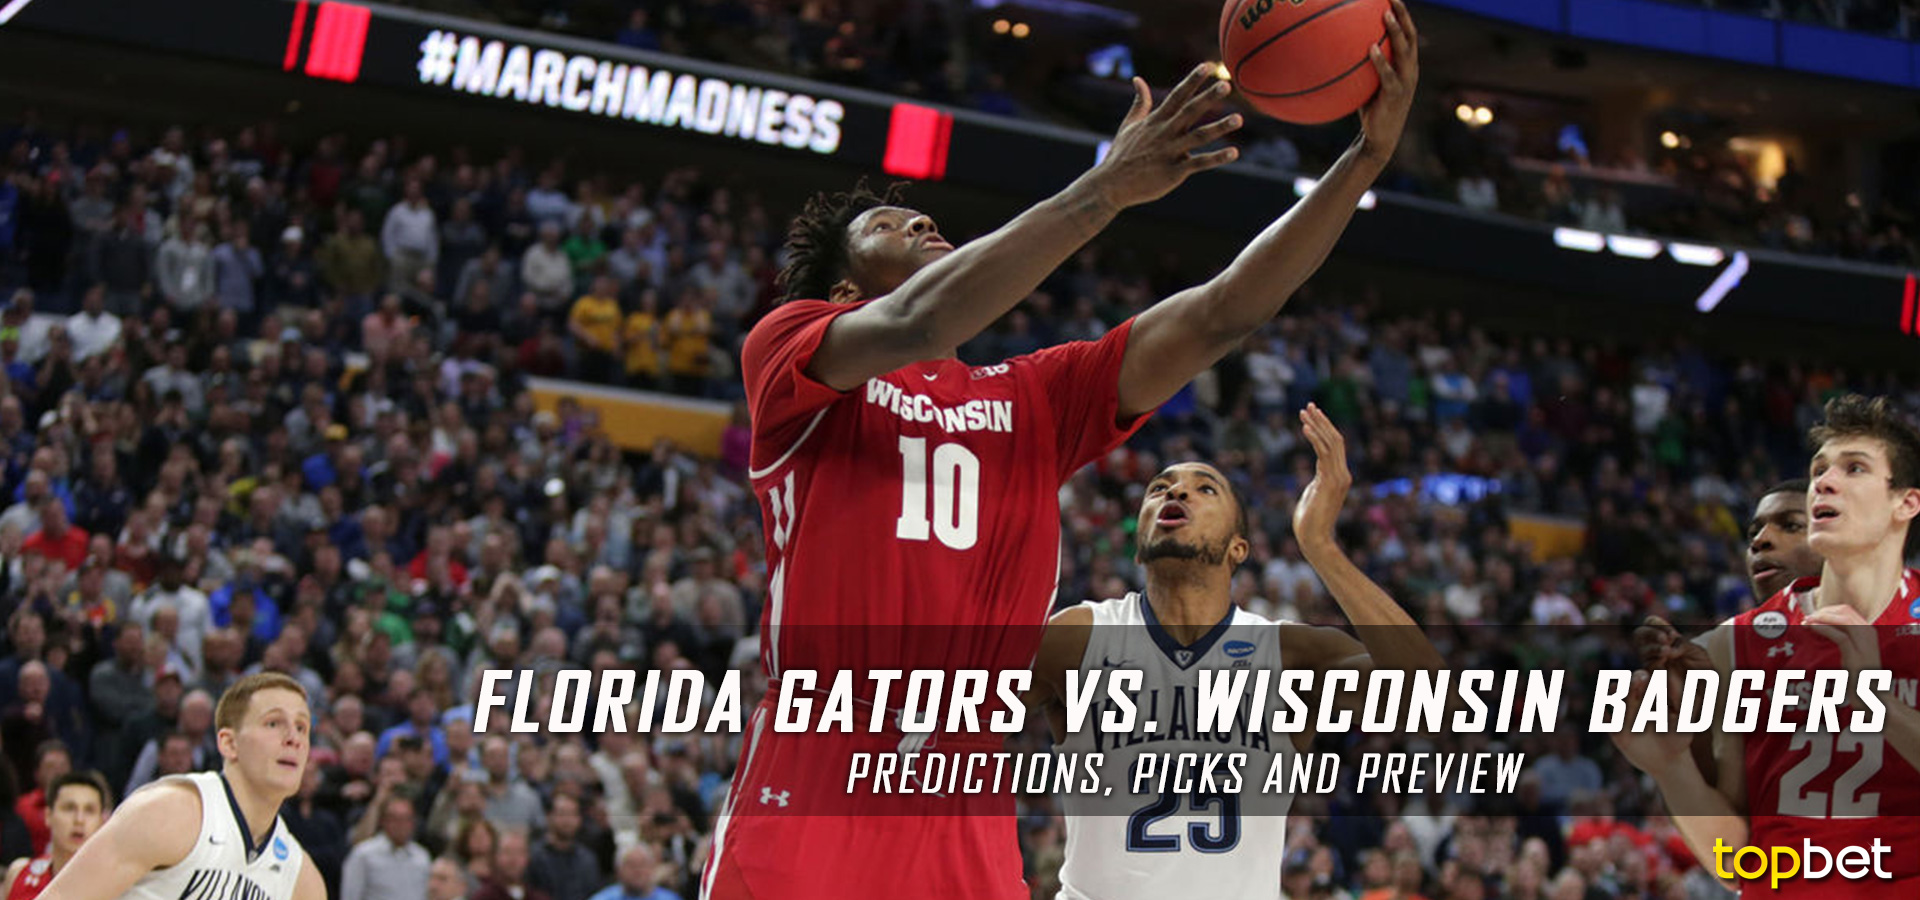 Florida vs Wisconsin March Madness 2017 Predictions / Picks